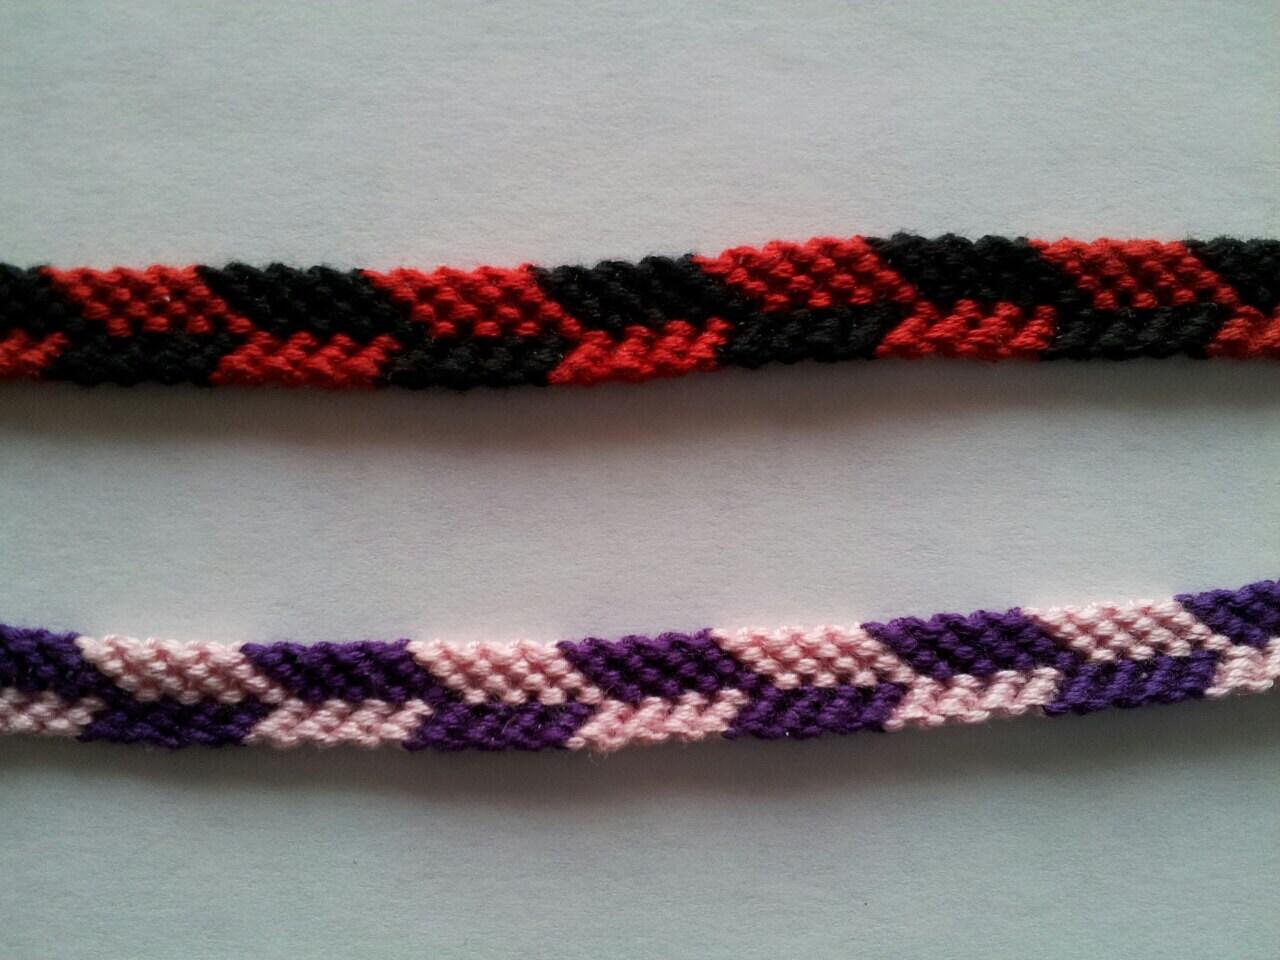 checkered friendship bracelets string friendship arrow